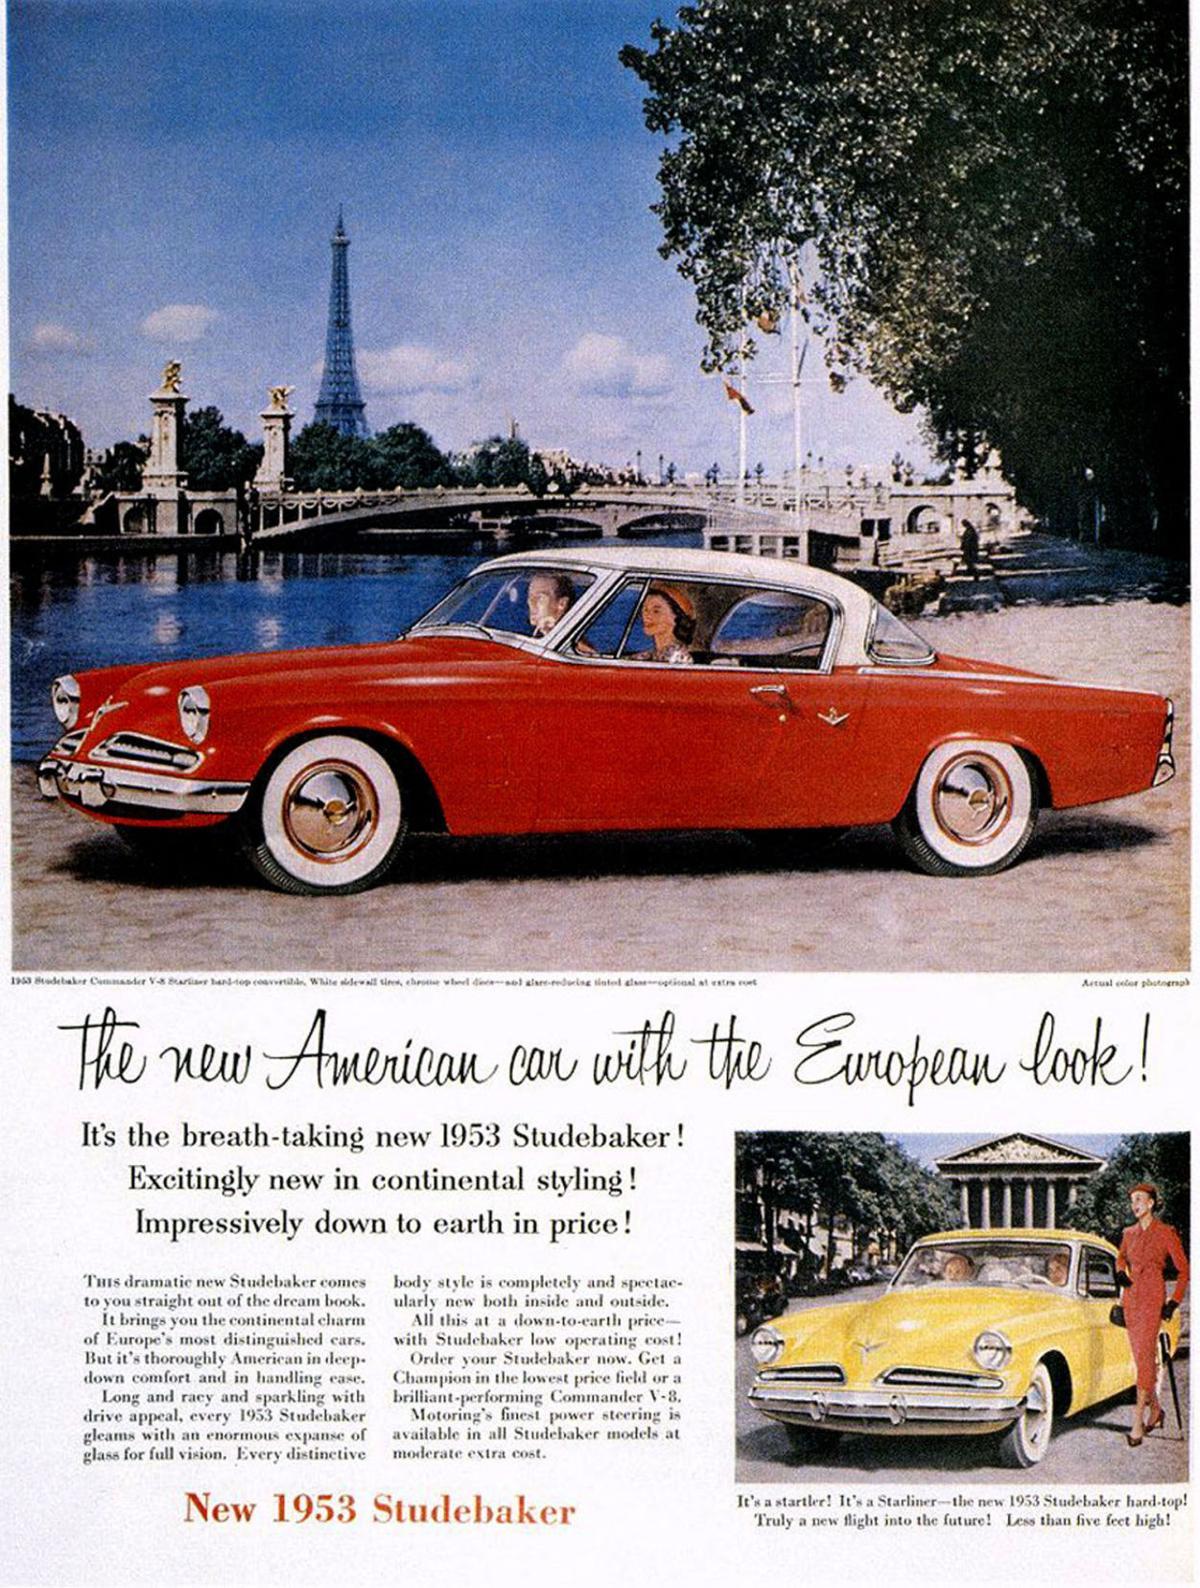 The 1953 Studebaker Commander Deluxe Starliner Coupe was sleek and Cartoon Vw Golf Car Drawings Of Volkswagen Steering Wheel Editorial Photo Dealer on